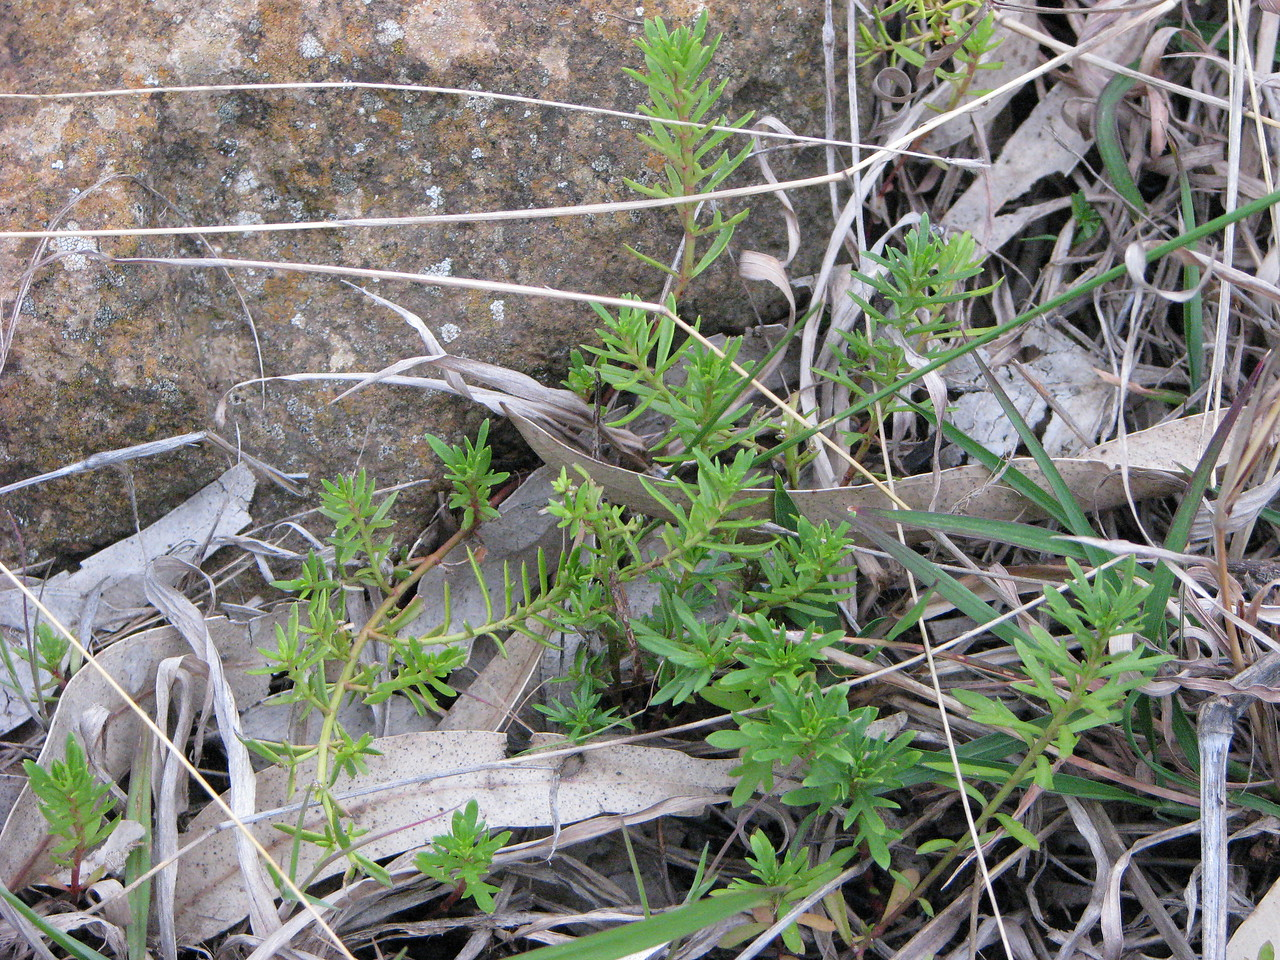 Haloragis heterophylla / Variable Raspwort